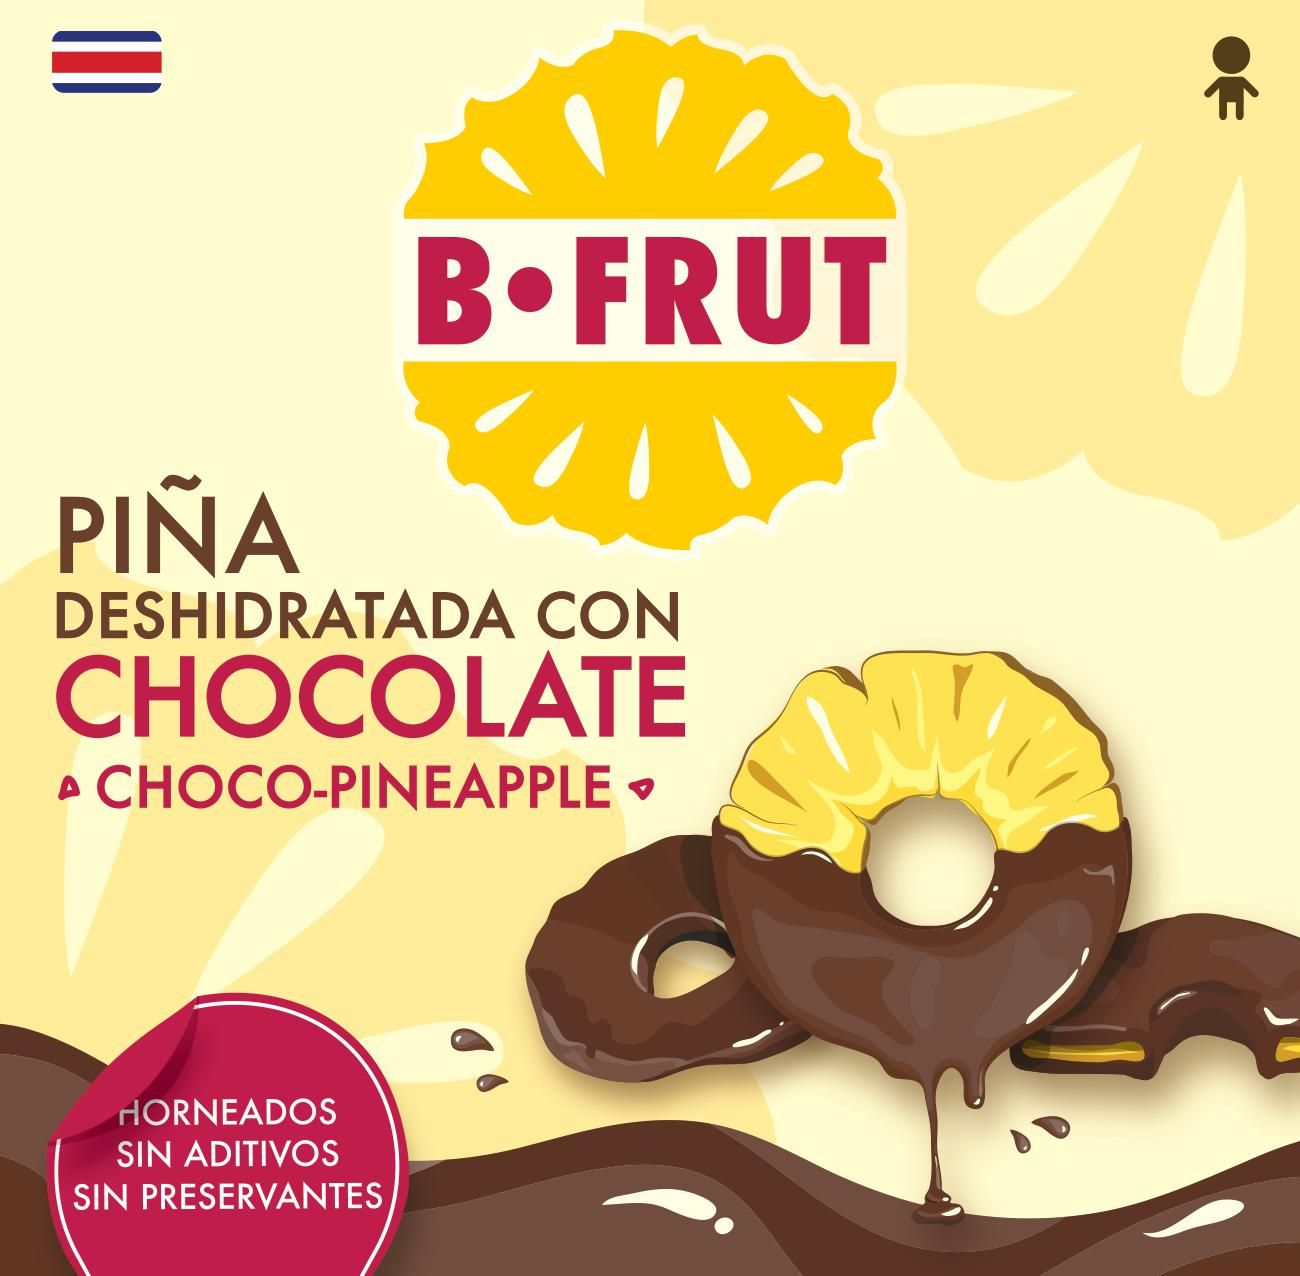 Rodajas de piña con chocolate... Frutas deshidratadas Costa Rica. www.befrut.com